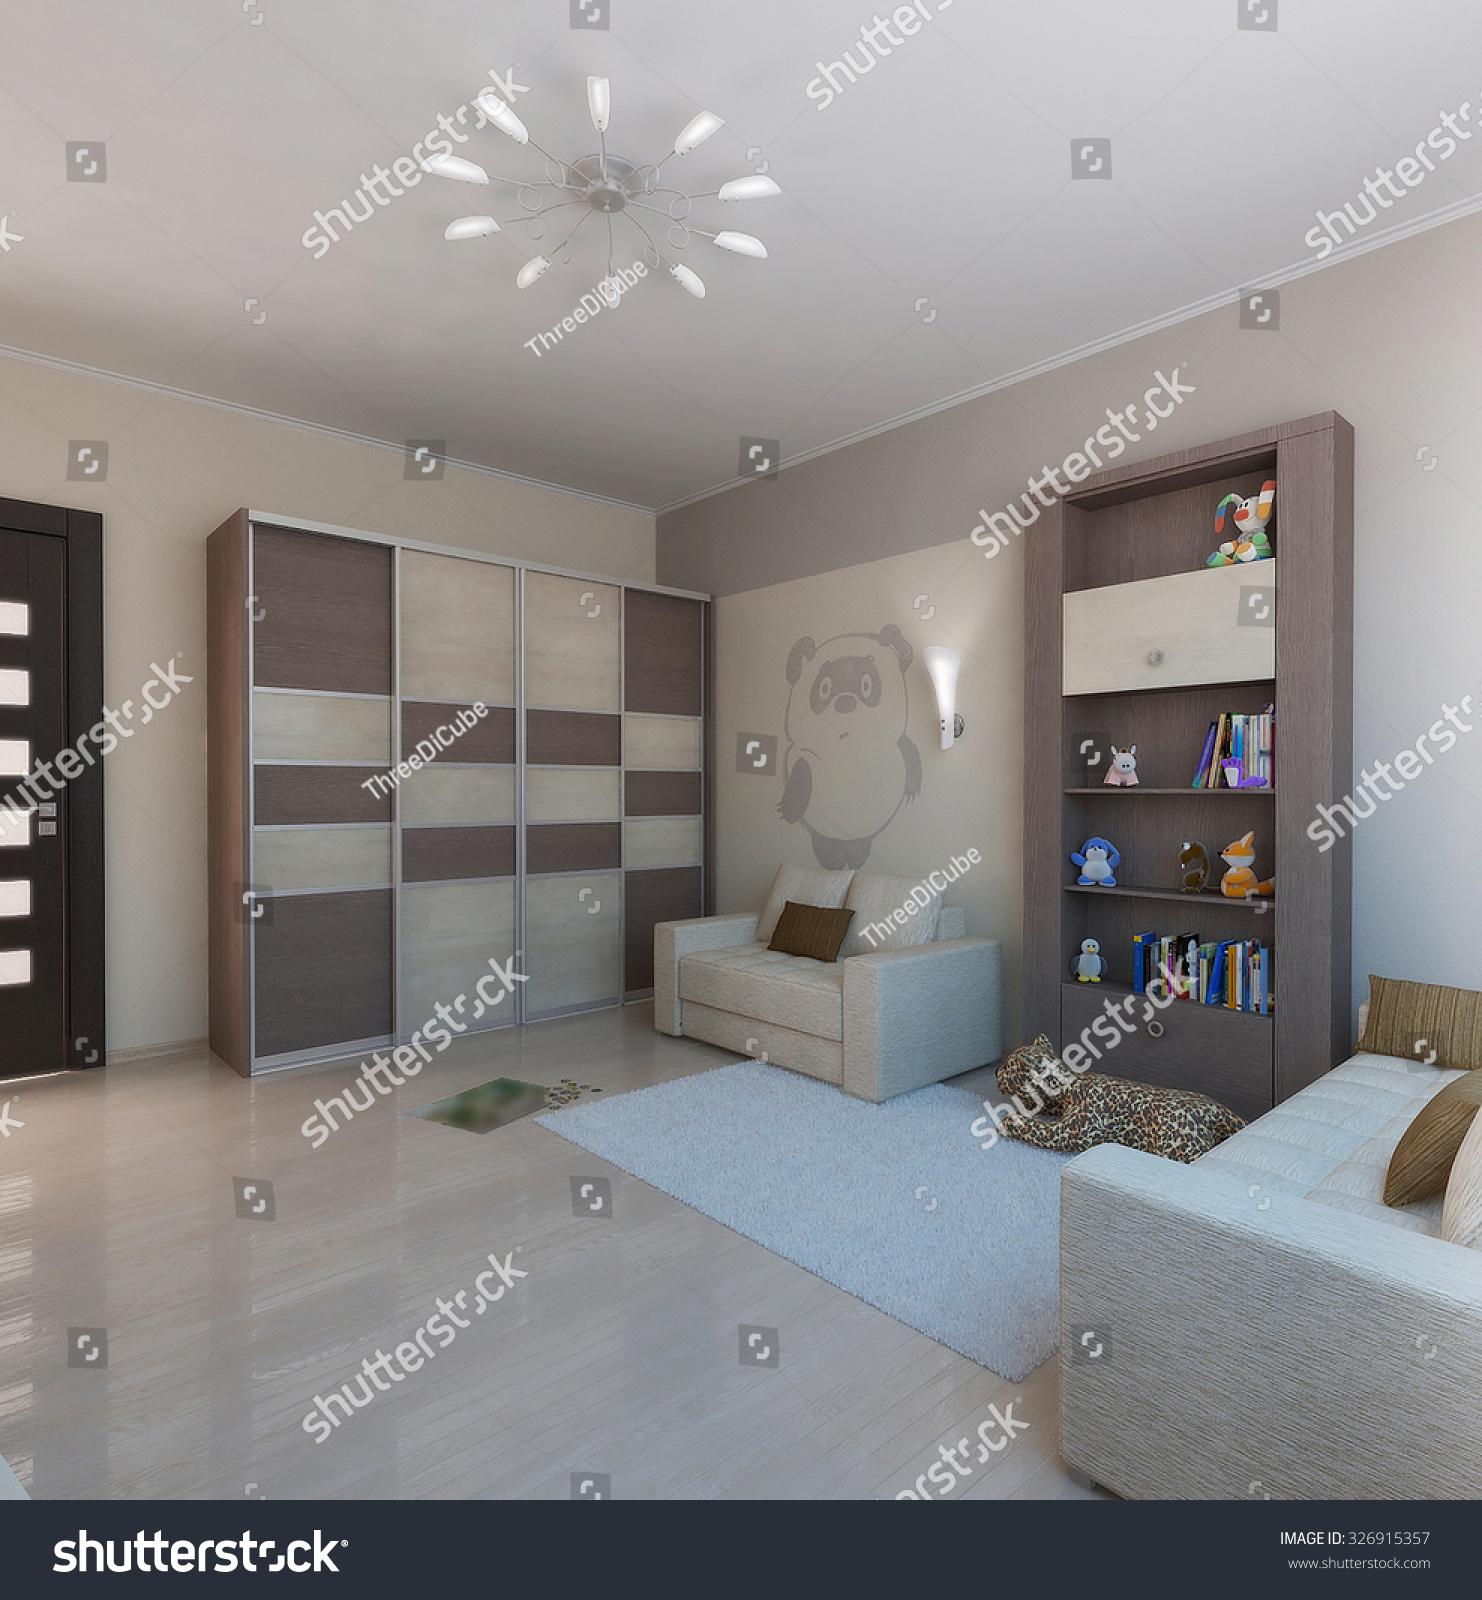 Royalty Free Stock Illustration of Children Room Minimalist Style ...